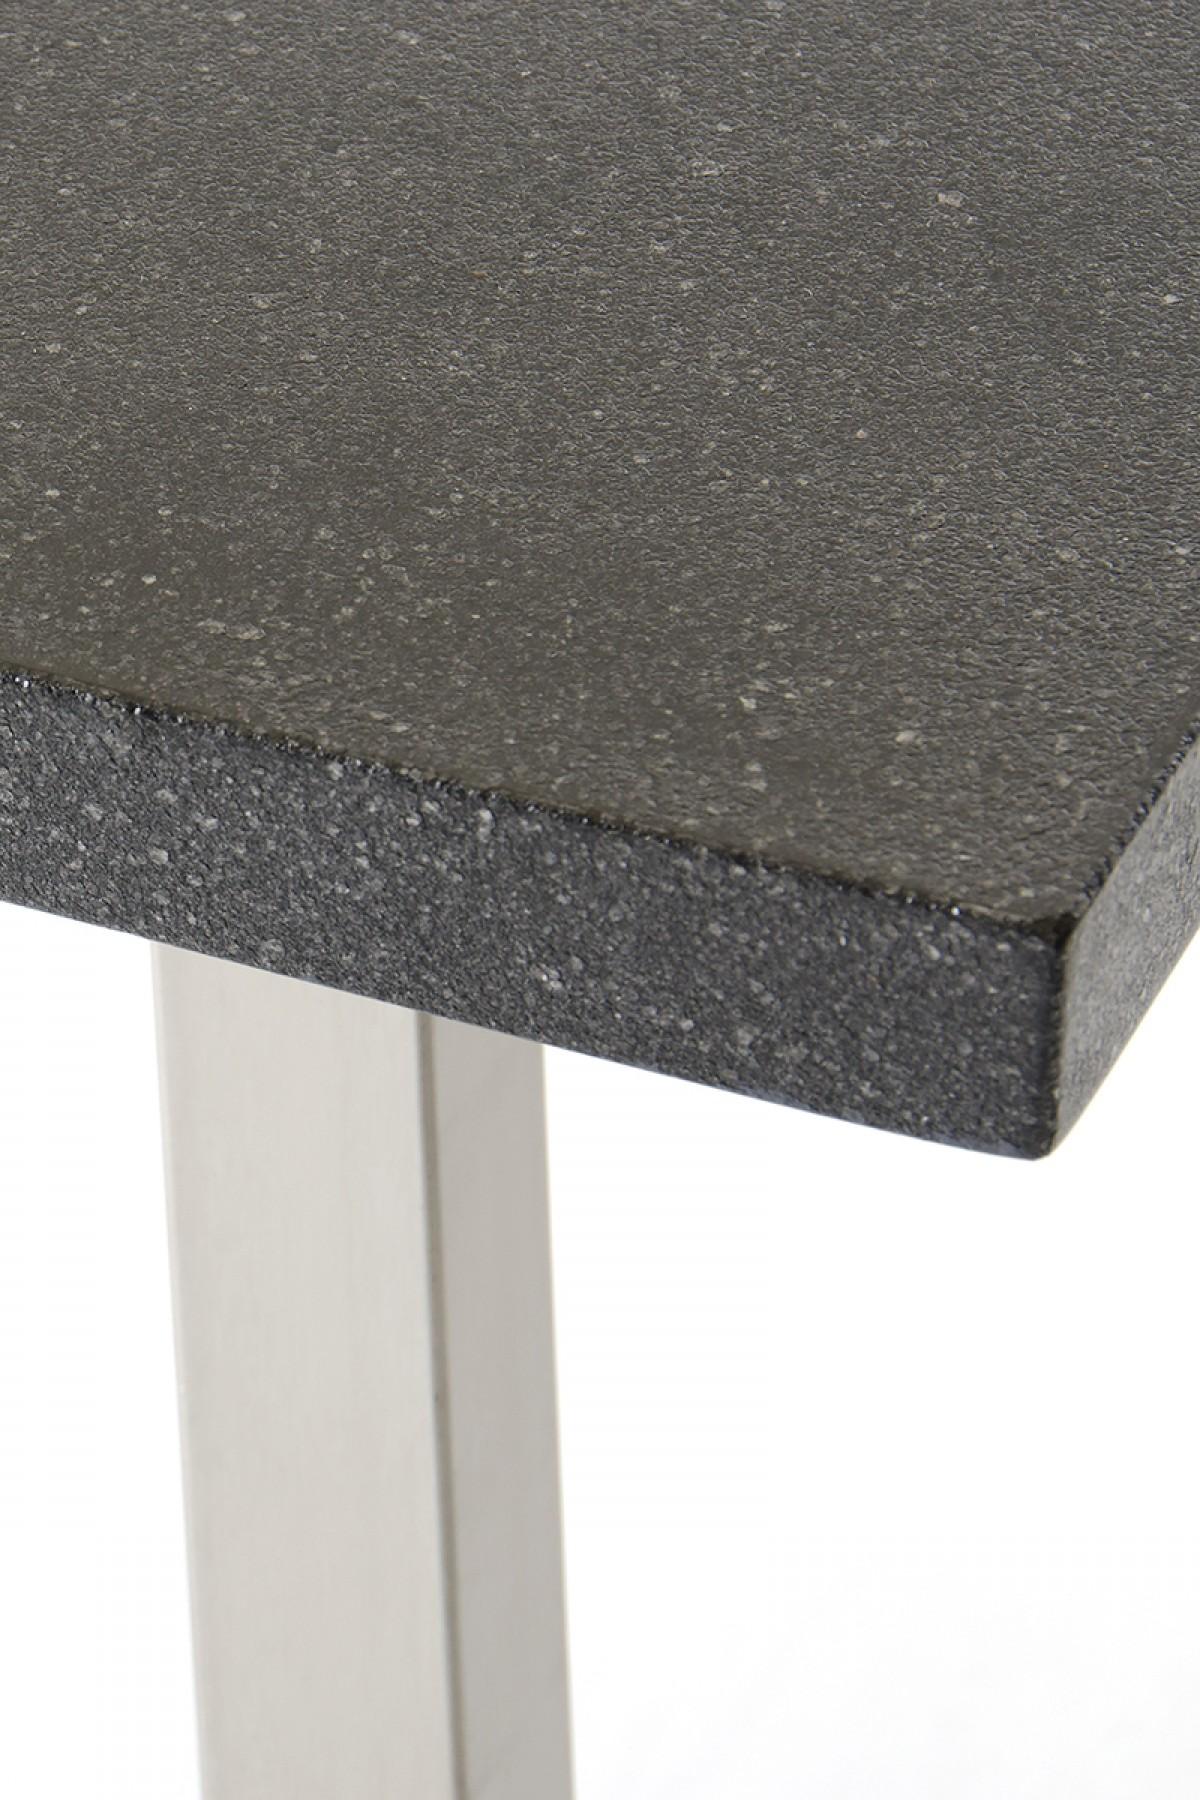 lanikai black granite dining table close up2